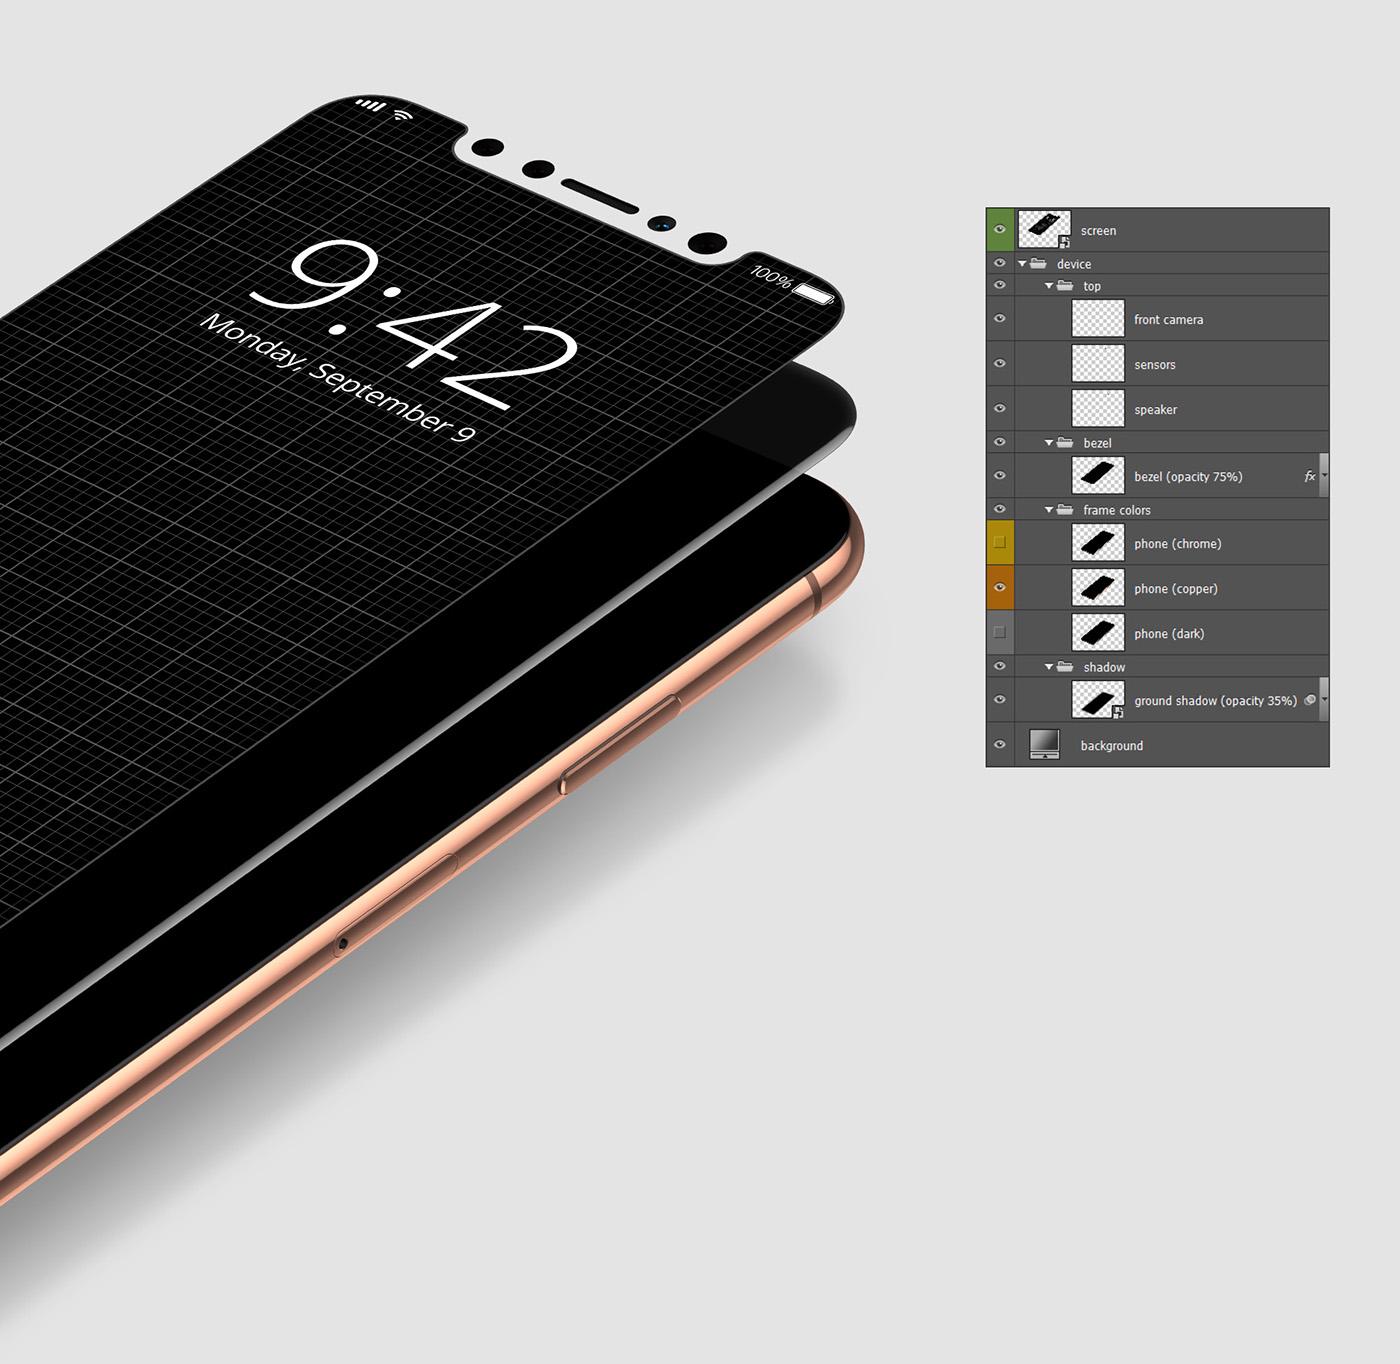 iphonex UI app iOS11 commercial Mockup mock-up smartphone smart object freebie